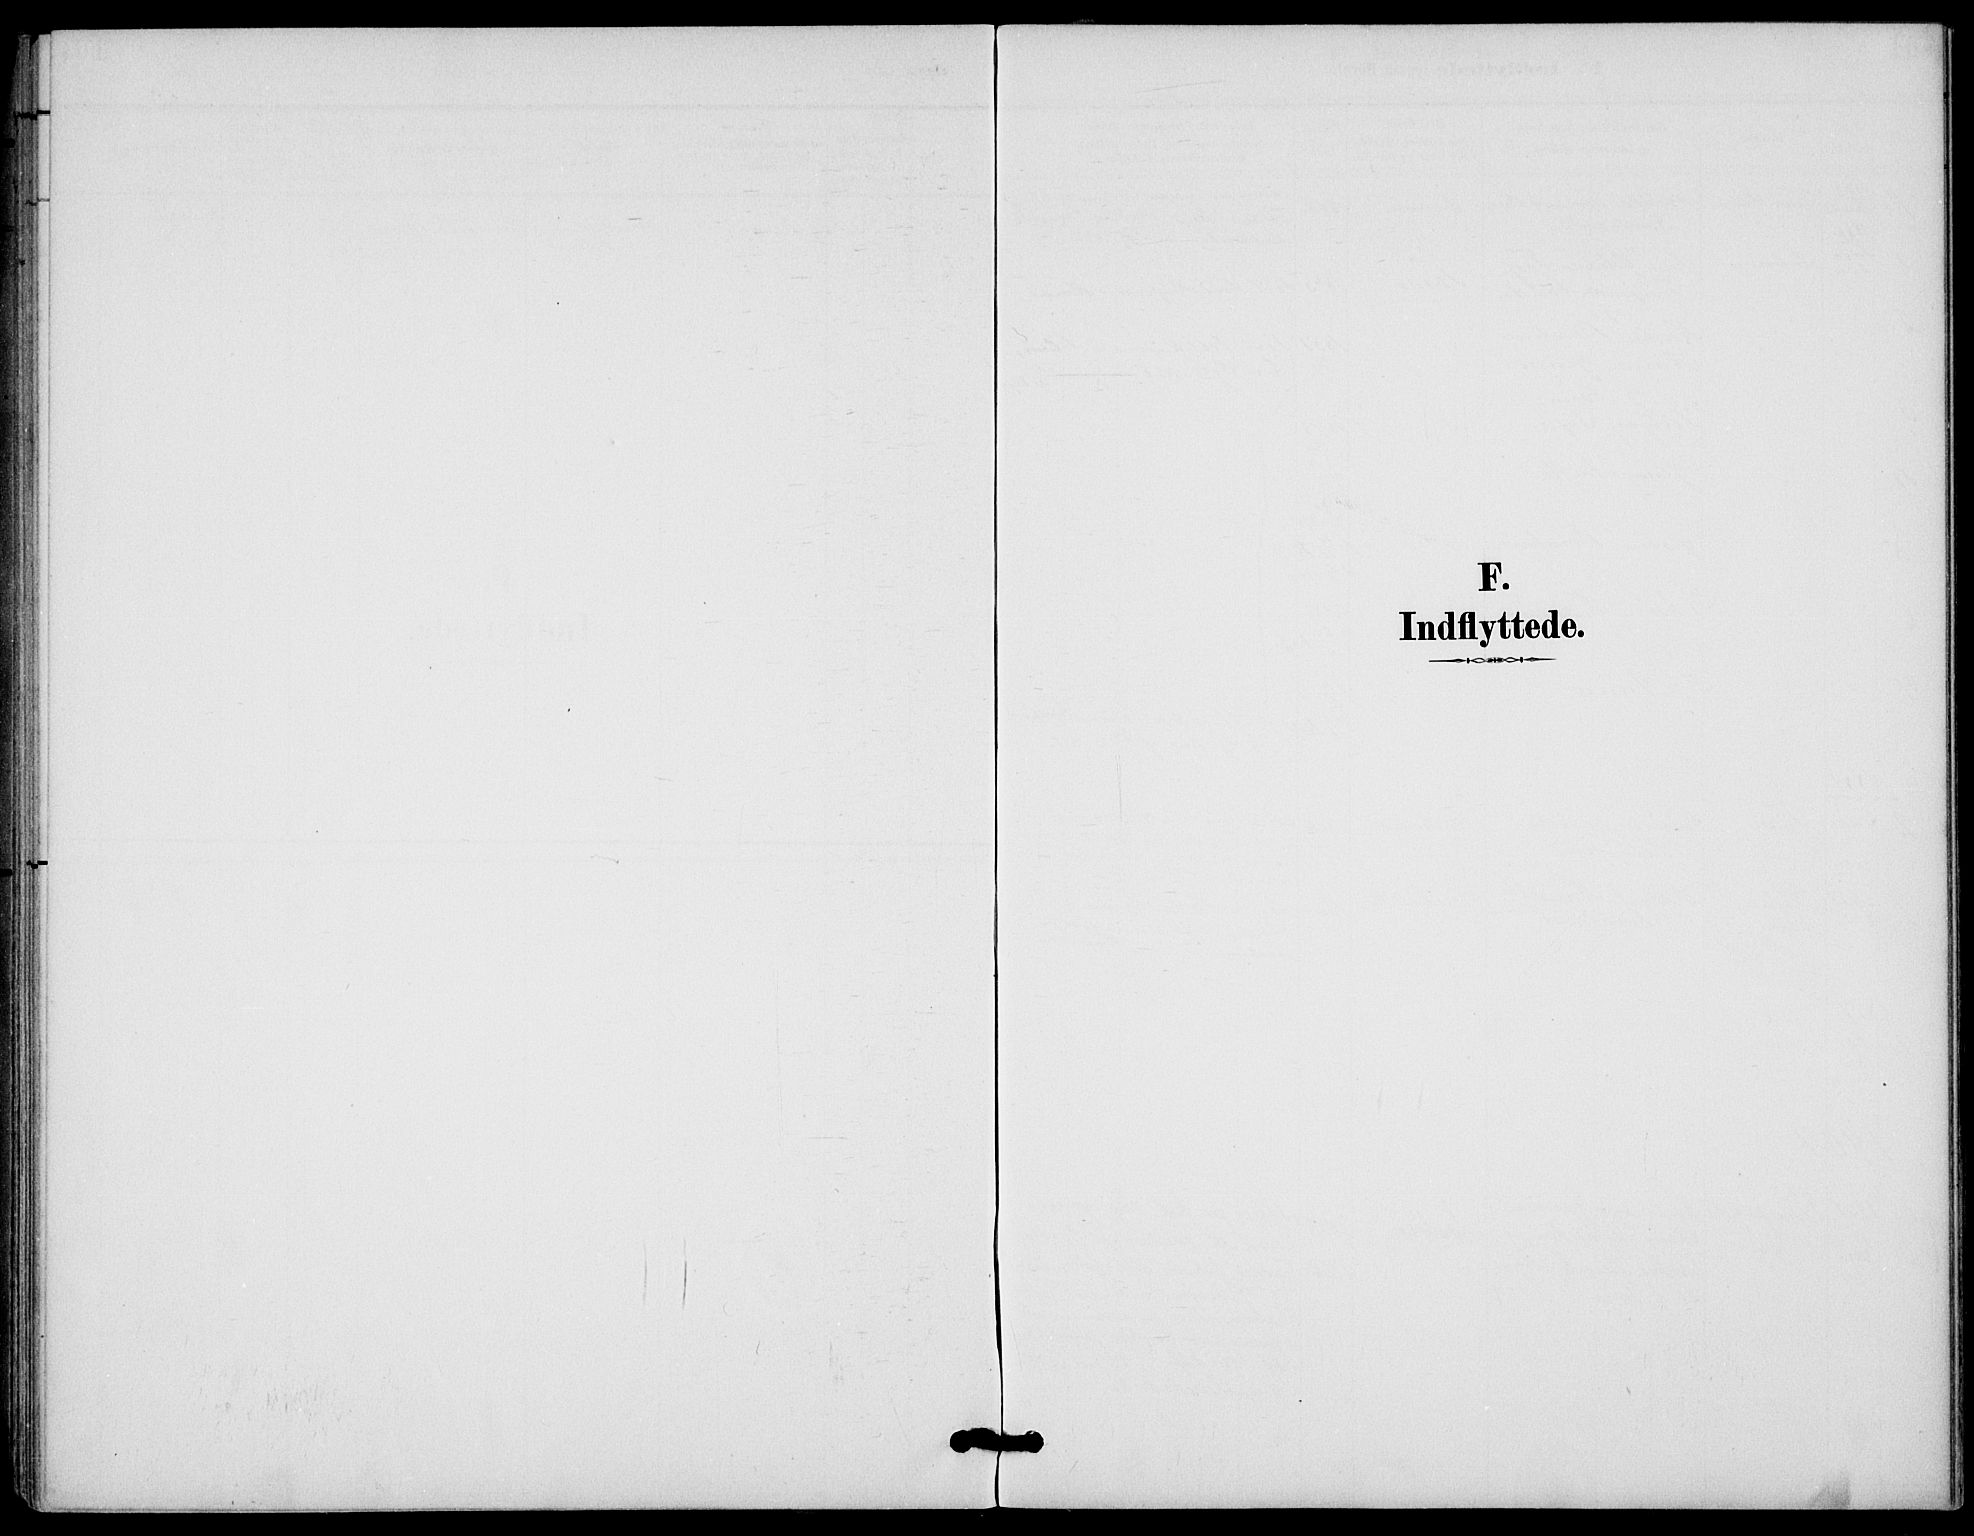 SAKO, Gransherad kirkebøker, F/Fb/L0005: Ministerialbok nr. II 5, 1887-1916